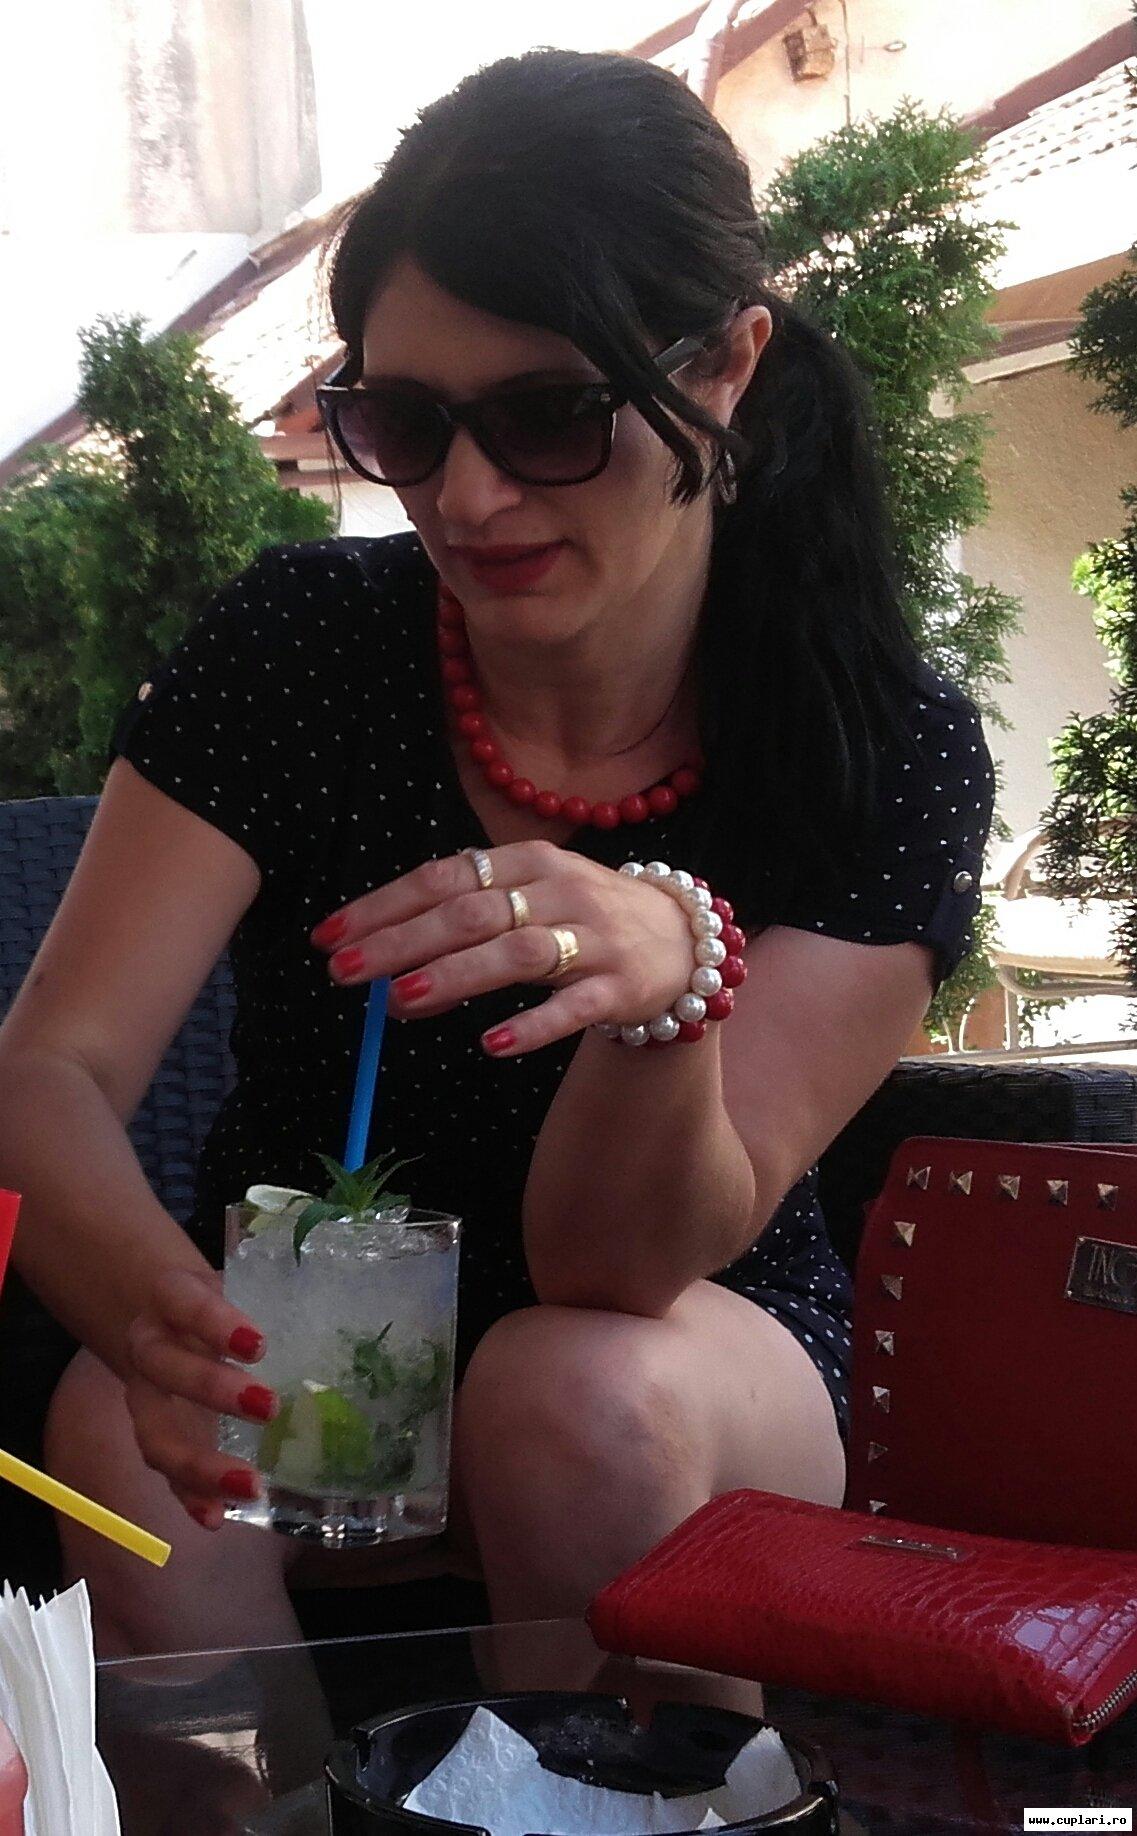 Femei din Târgu Mureș, Mureș - Dating online, Matrimoniale - Pagina 3 | cheilenereinfo.ro